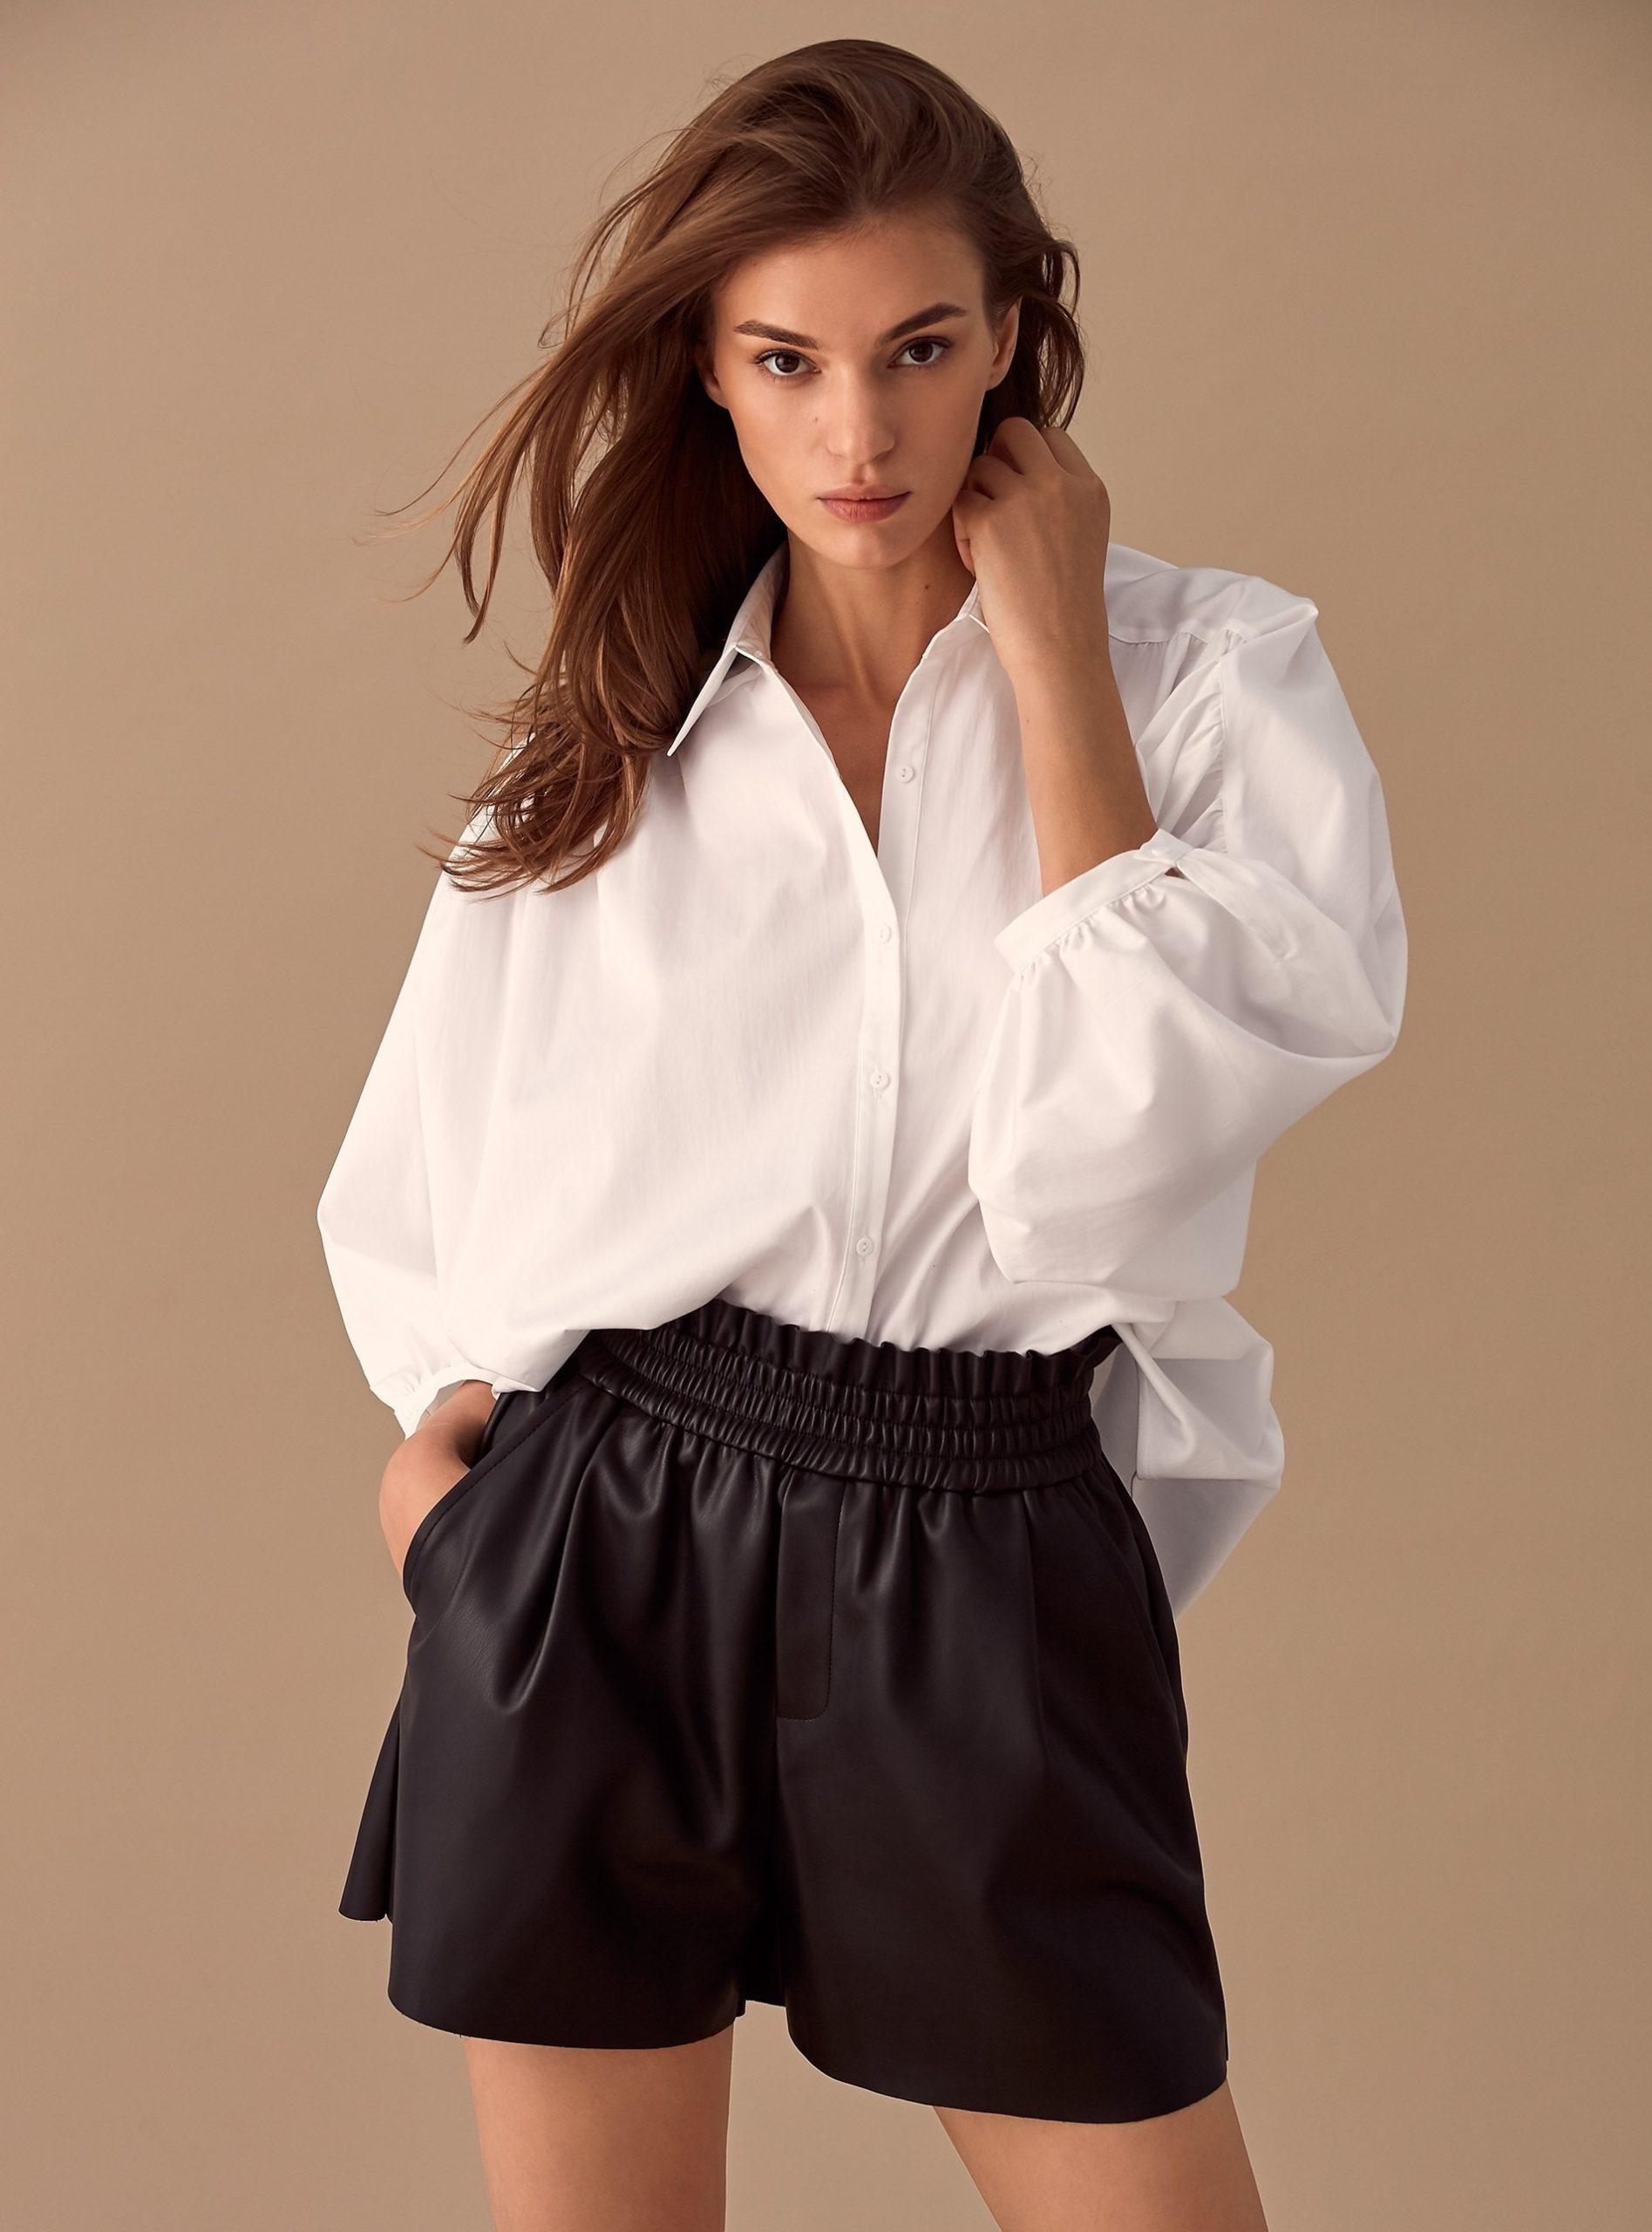 Девушка в рубашке и шортах